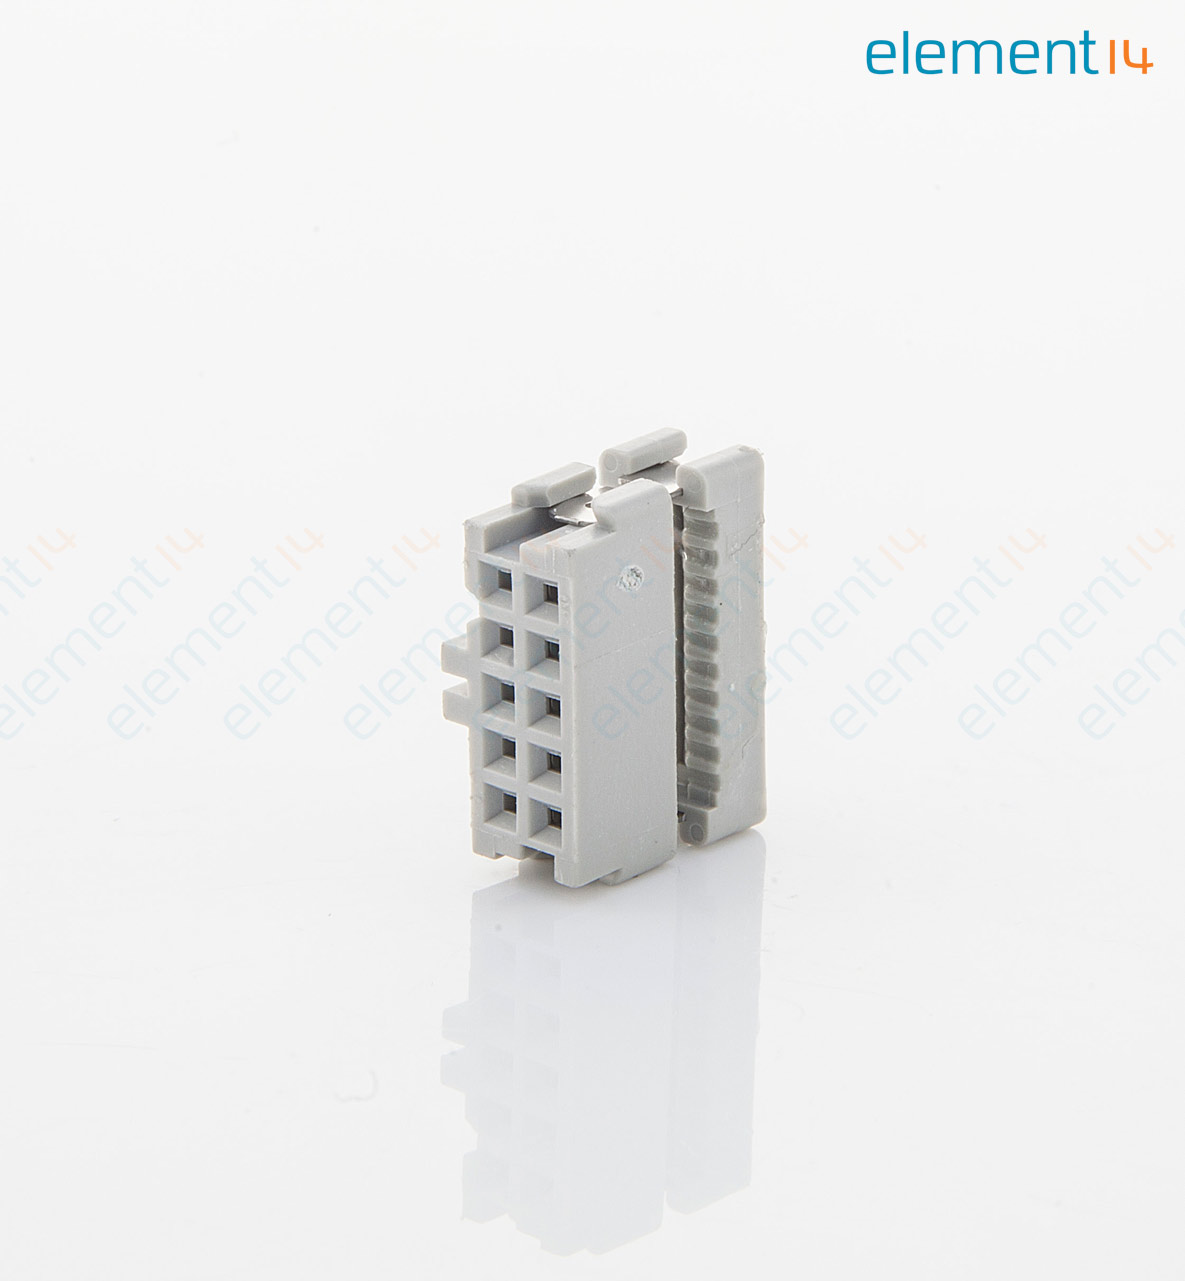 3473 6600 3m connecteur fil carte mm 10 contact s. Black Bedroom Furniture Sets. Home Design Ideas